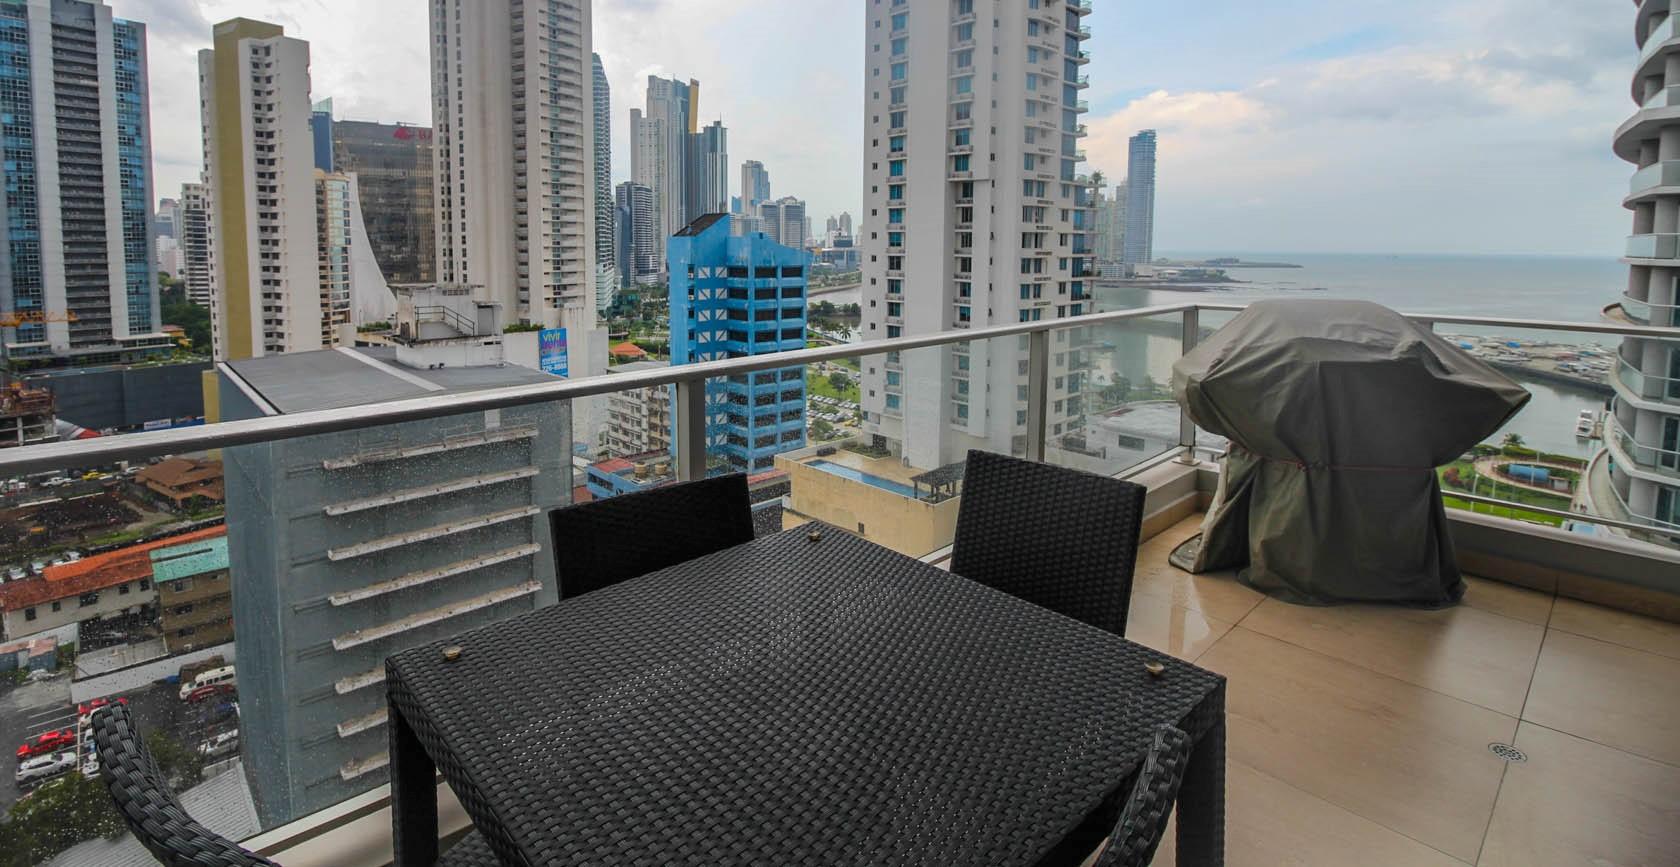 Avenida-Balboa-Panama-property-panamaequityocean-city-views-2nd-line-balboa-ave-3.jpg